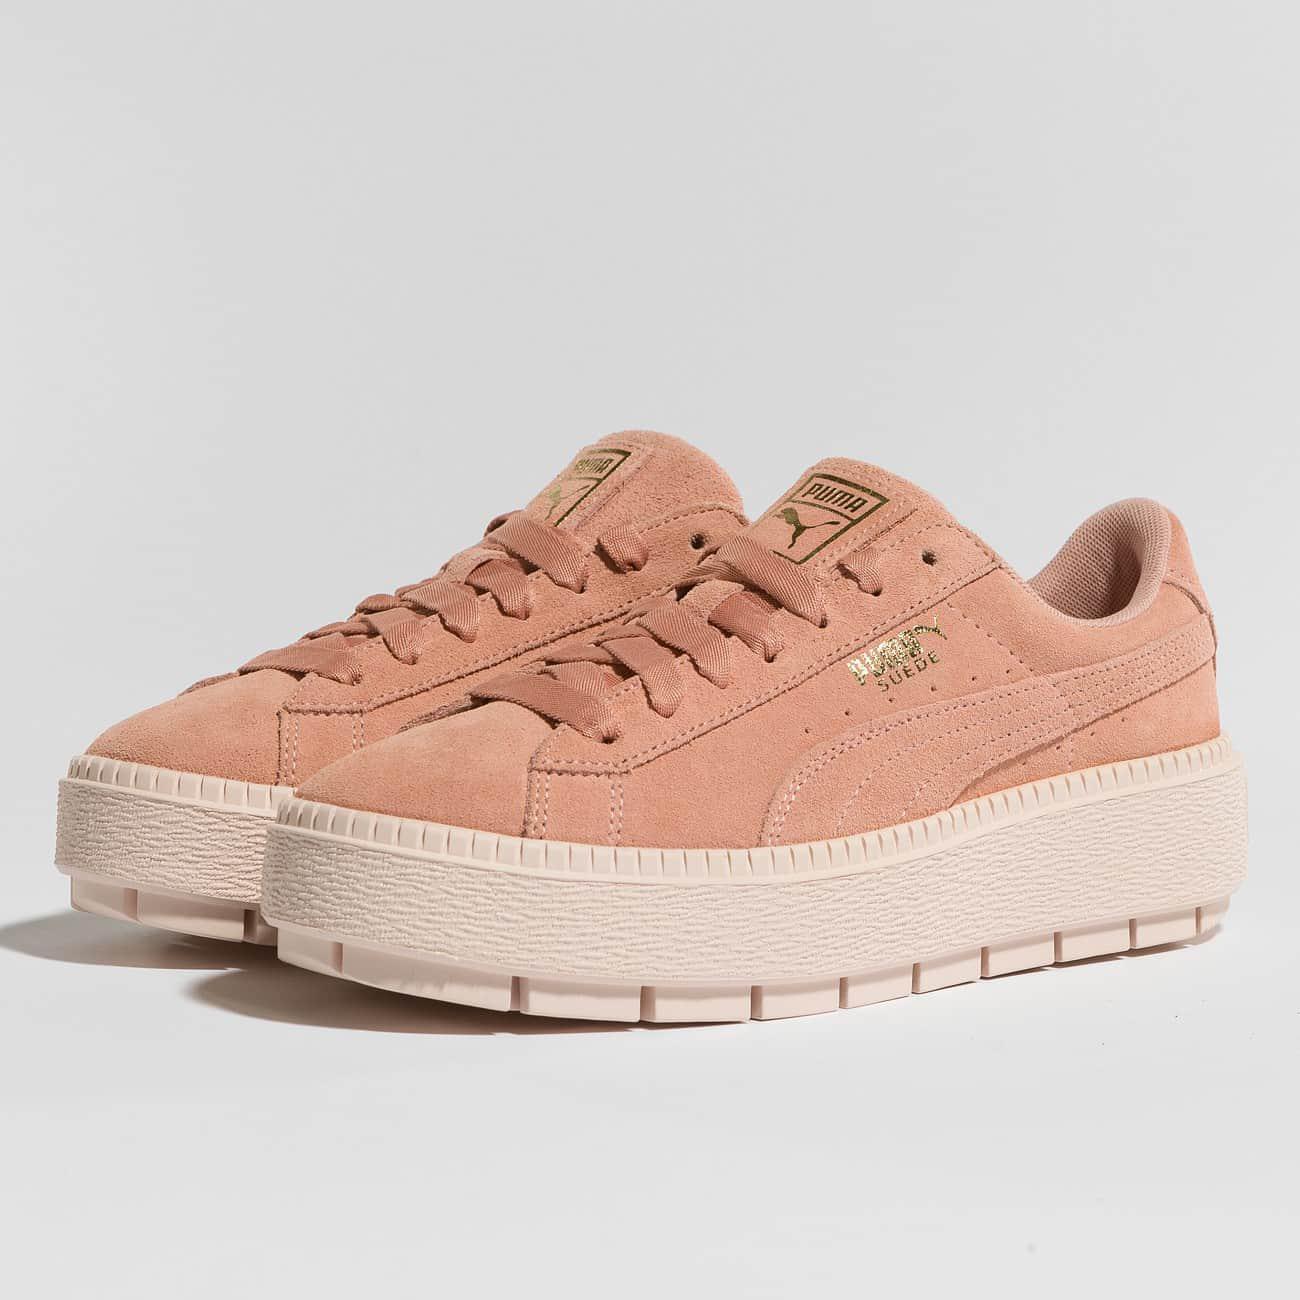 1cae0c8dac1 Lyst - Puma Wo Sneakers Platform Trace in Pink